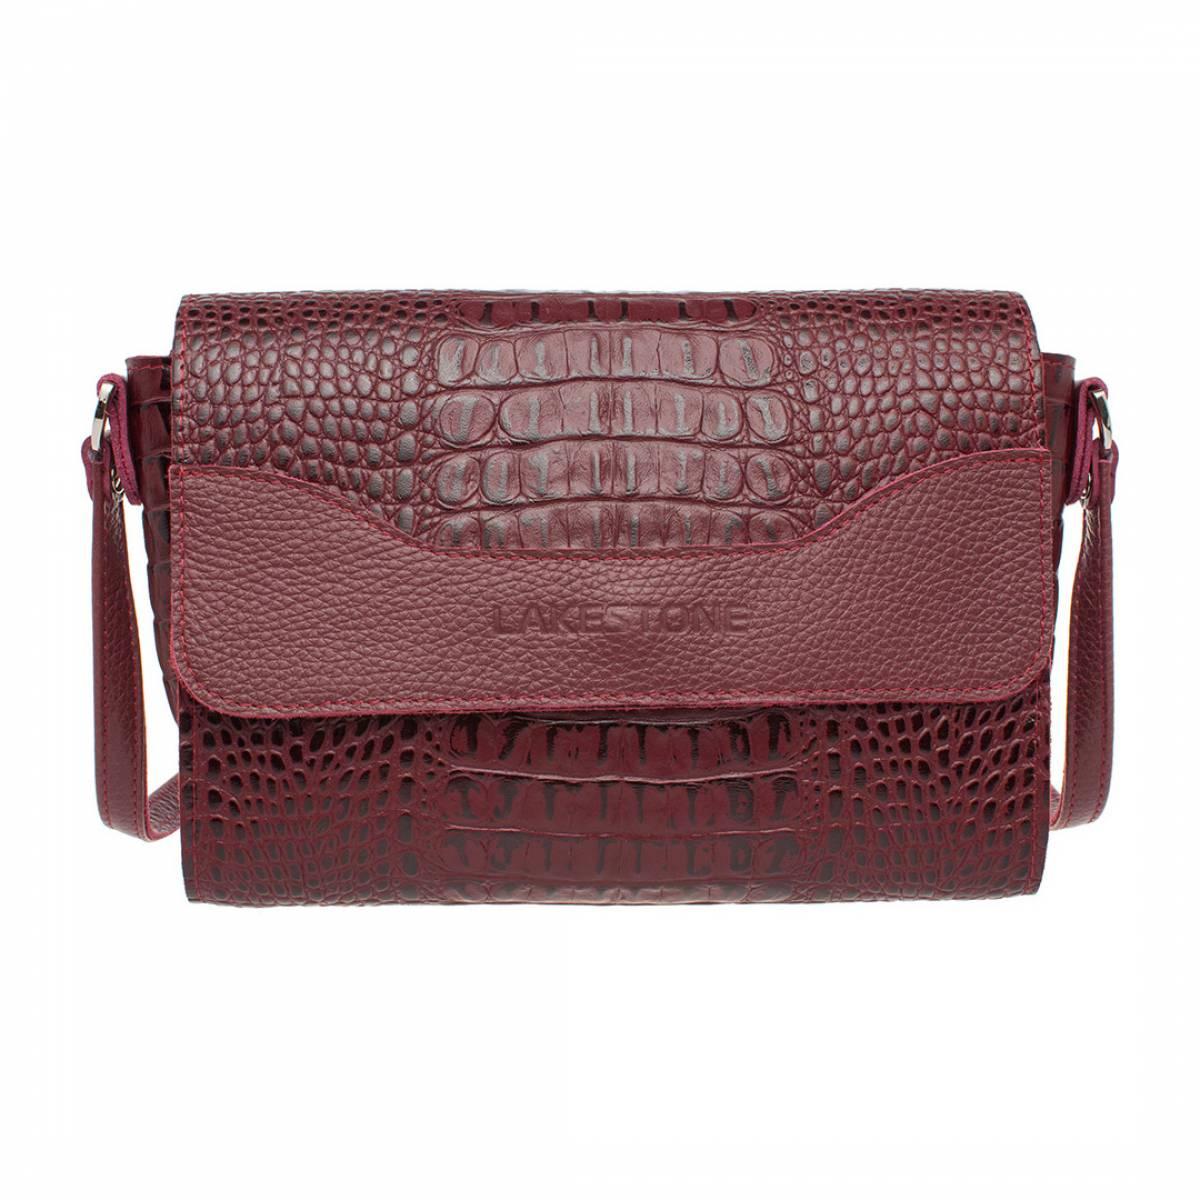 Женская сумка Kidney Burgundy фото